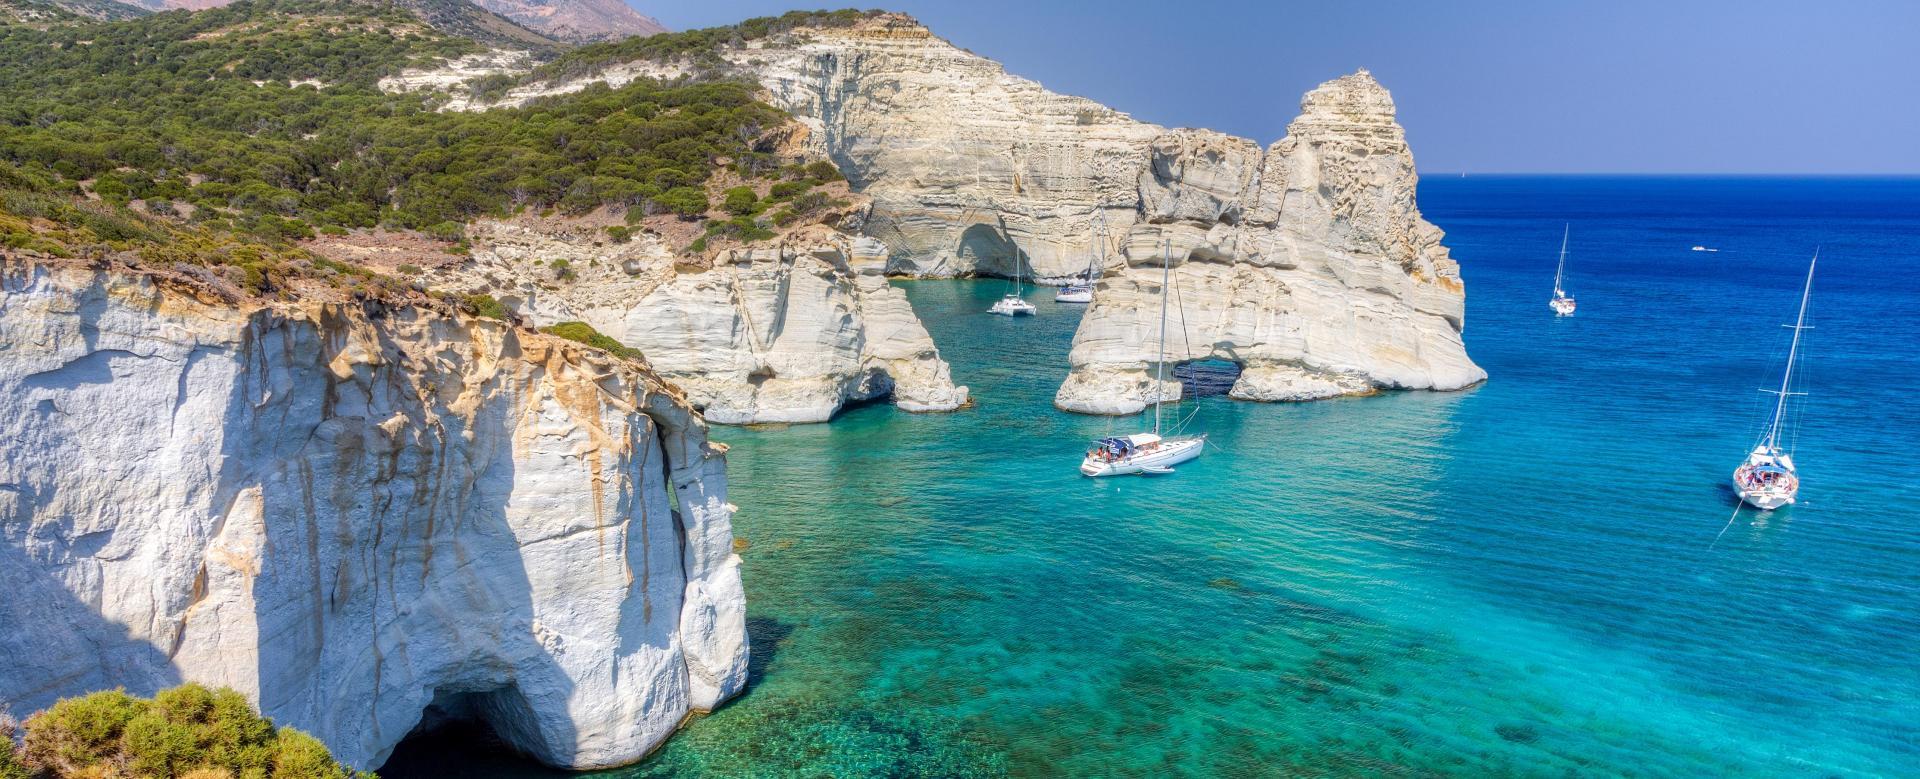 Voyage à pied : Cyclades occidentales : sifnos et milos